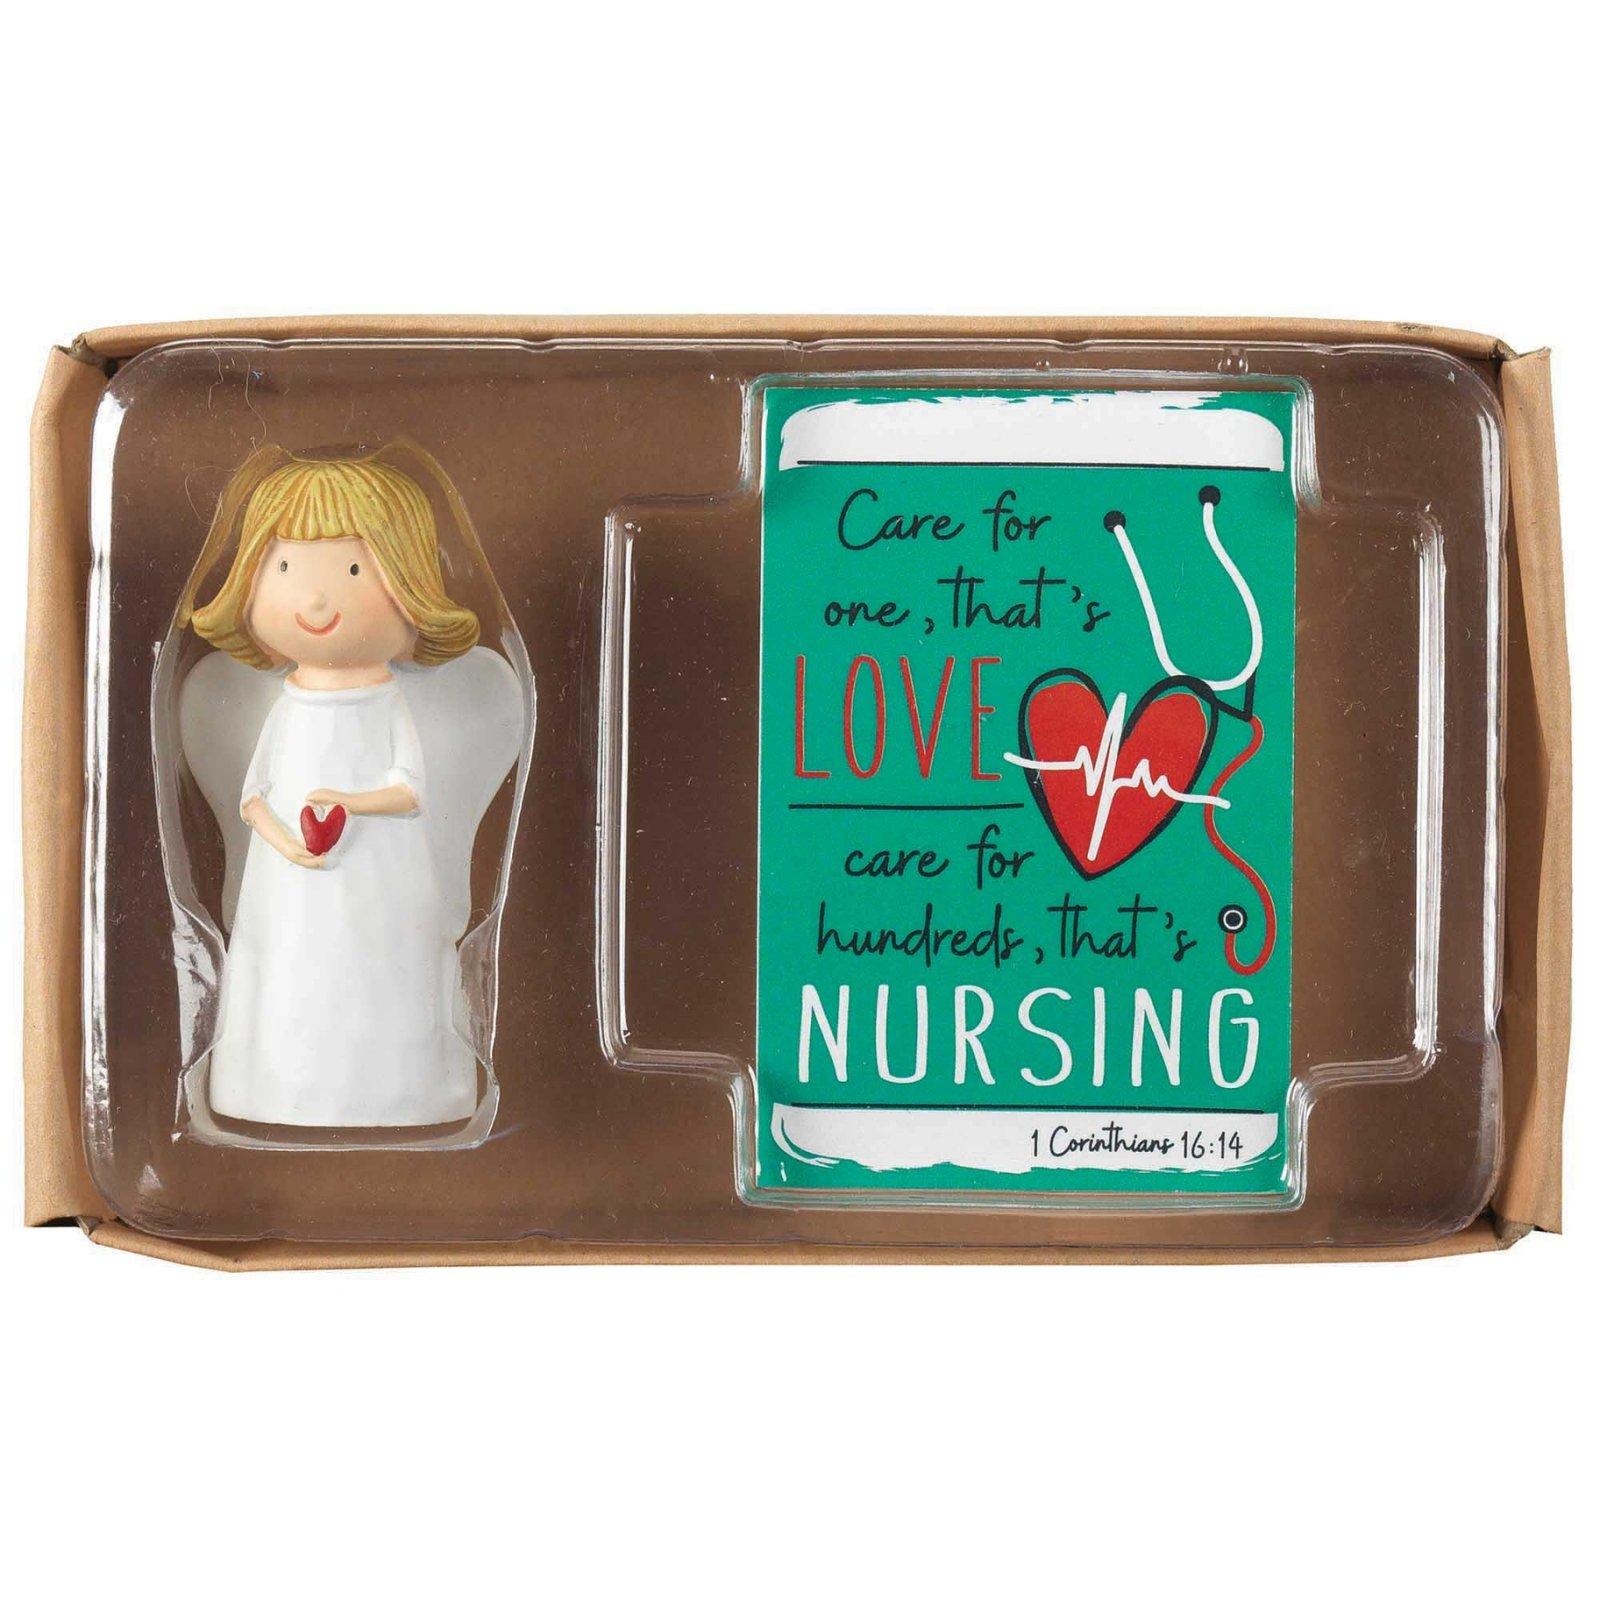 Angel Hrt/Crd Nurse Care For One Rsn